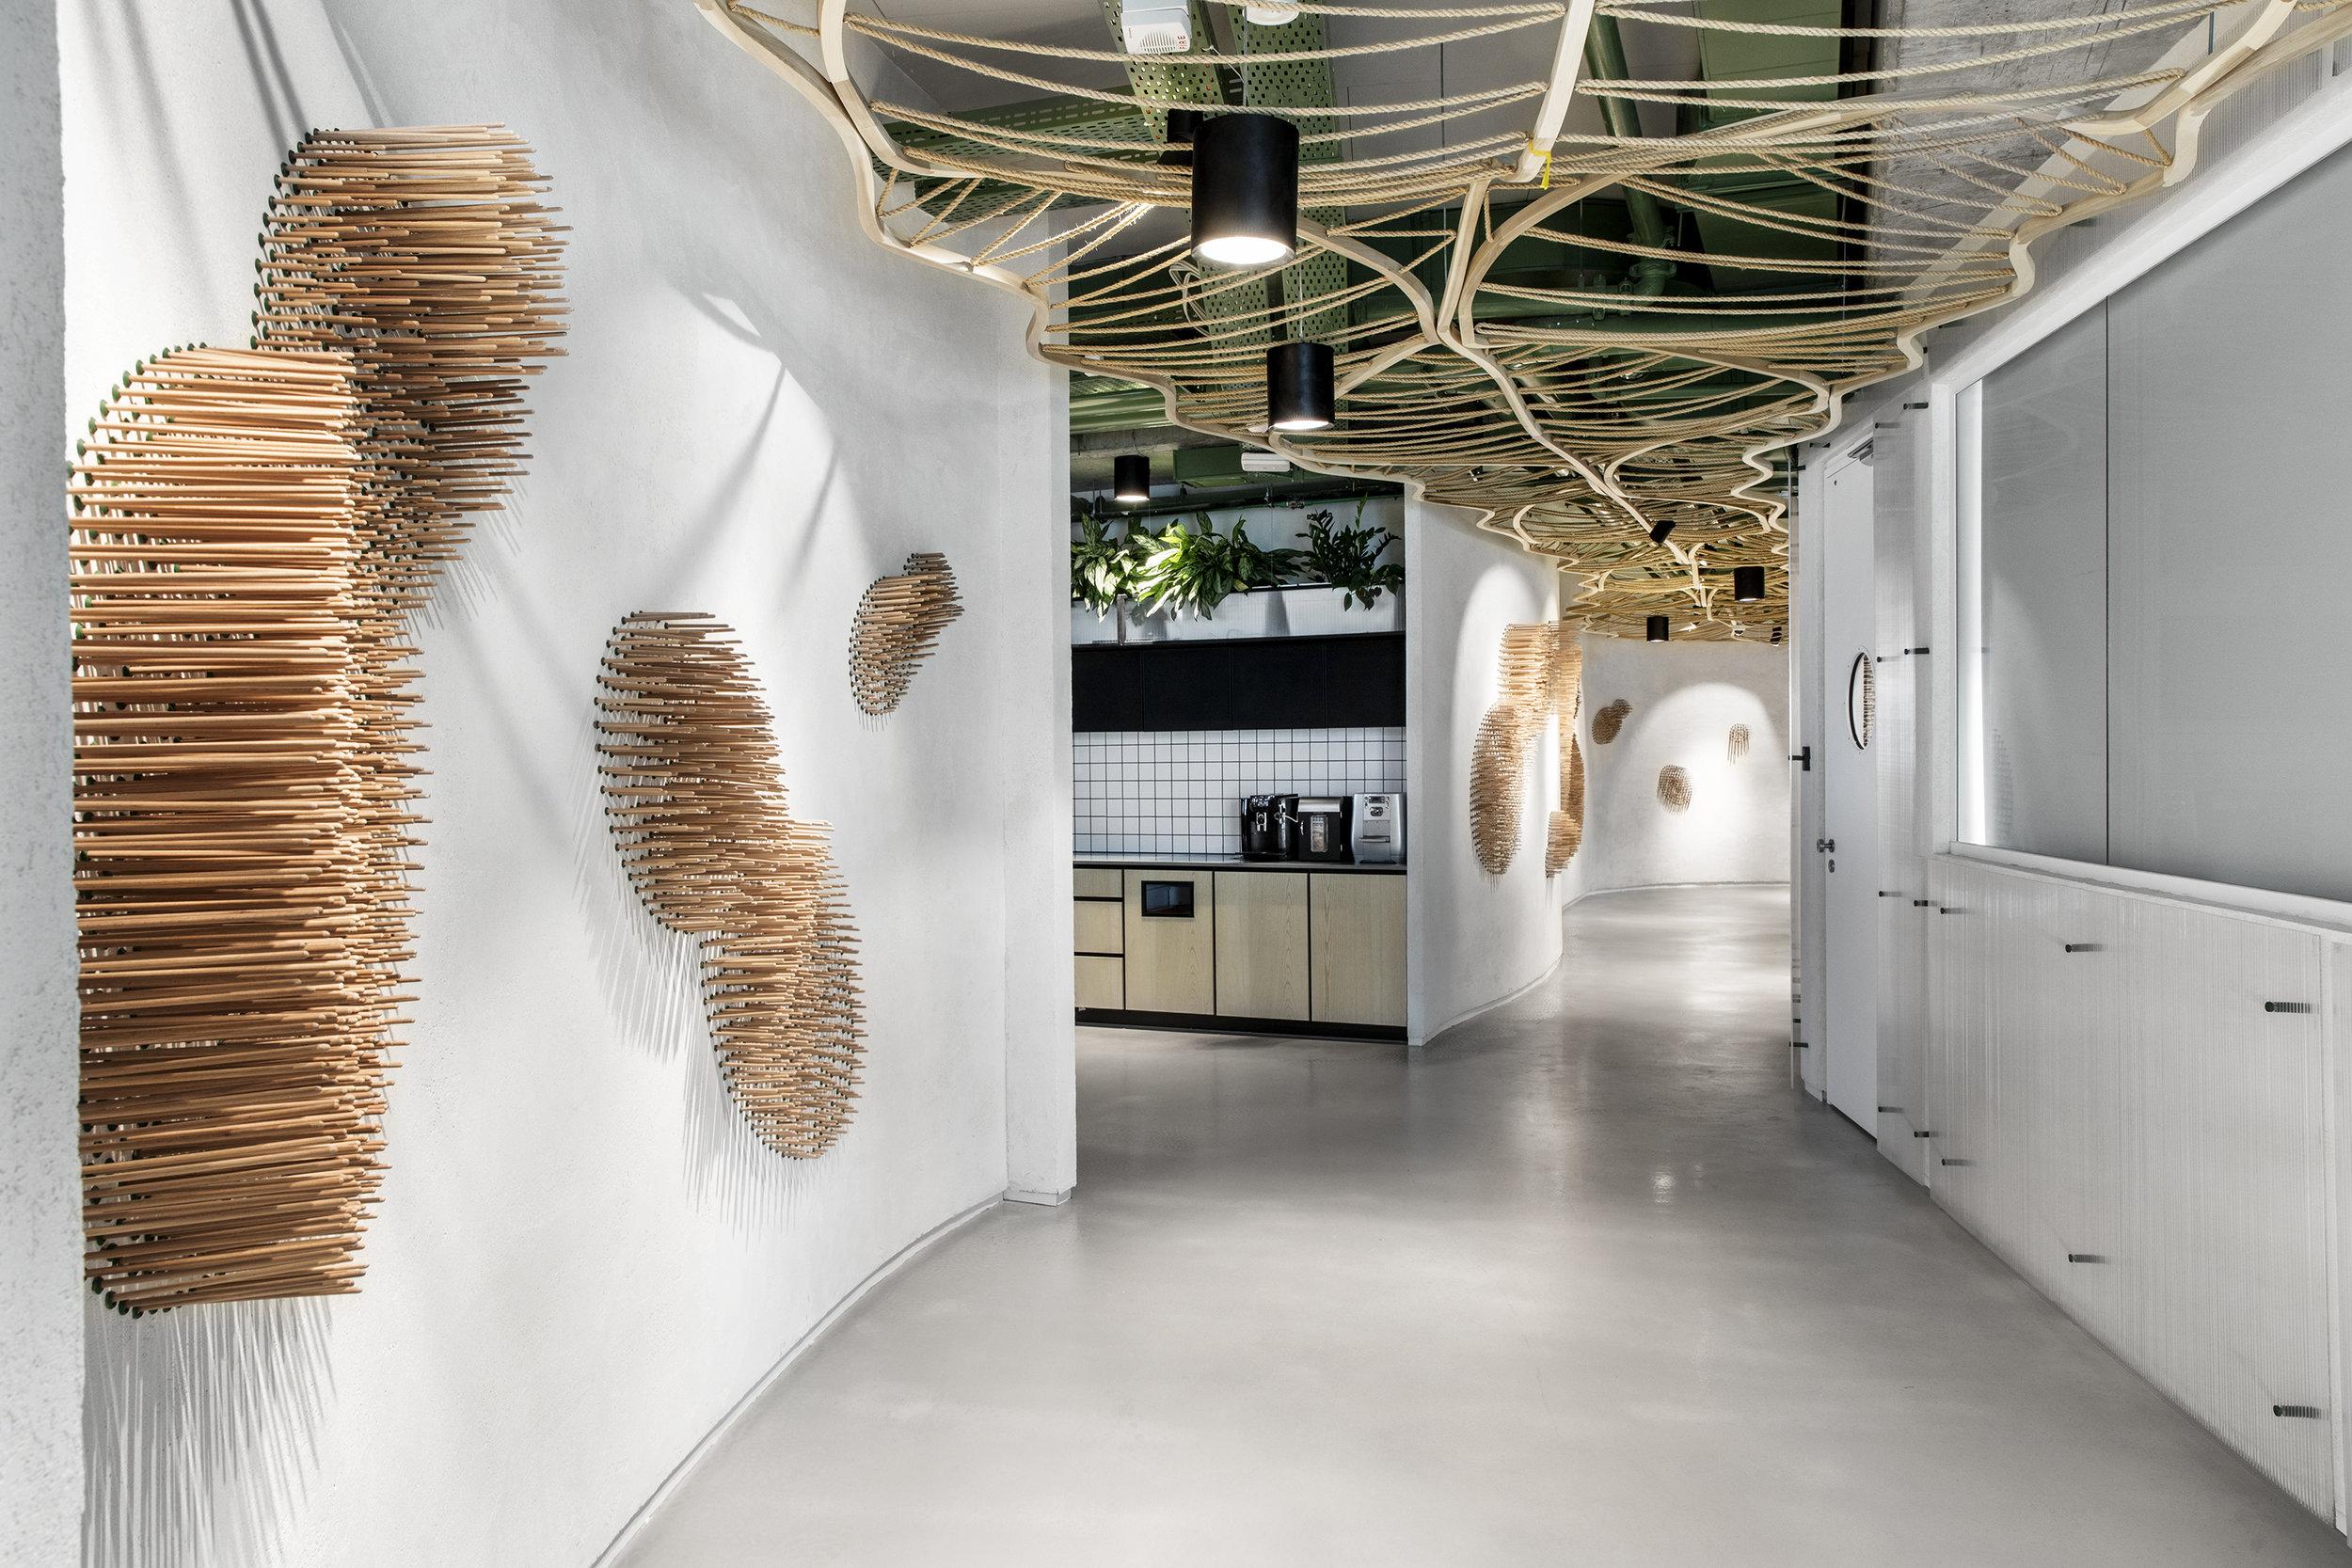 HINNOMAN - ROY DAVID ARCHTECTURE - STUDIO - סטודיו רואי דוד - אדריכלים (9).jpg